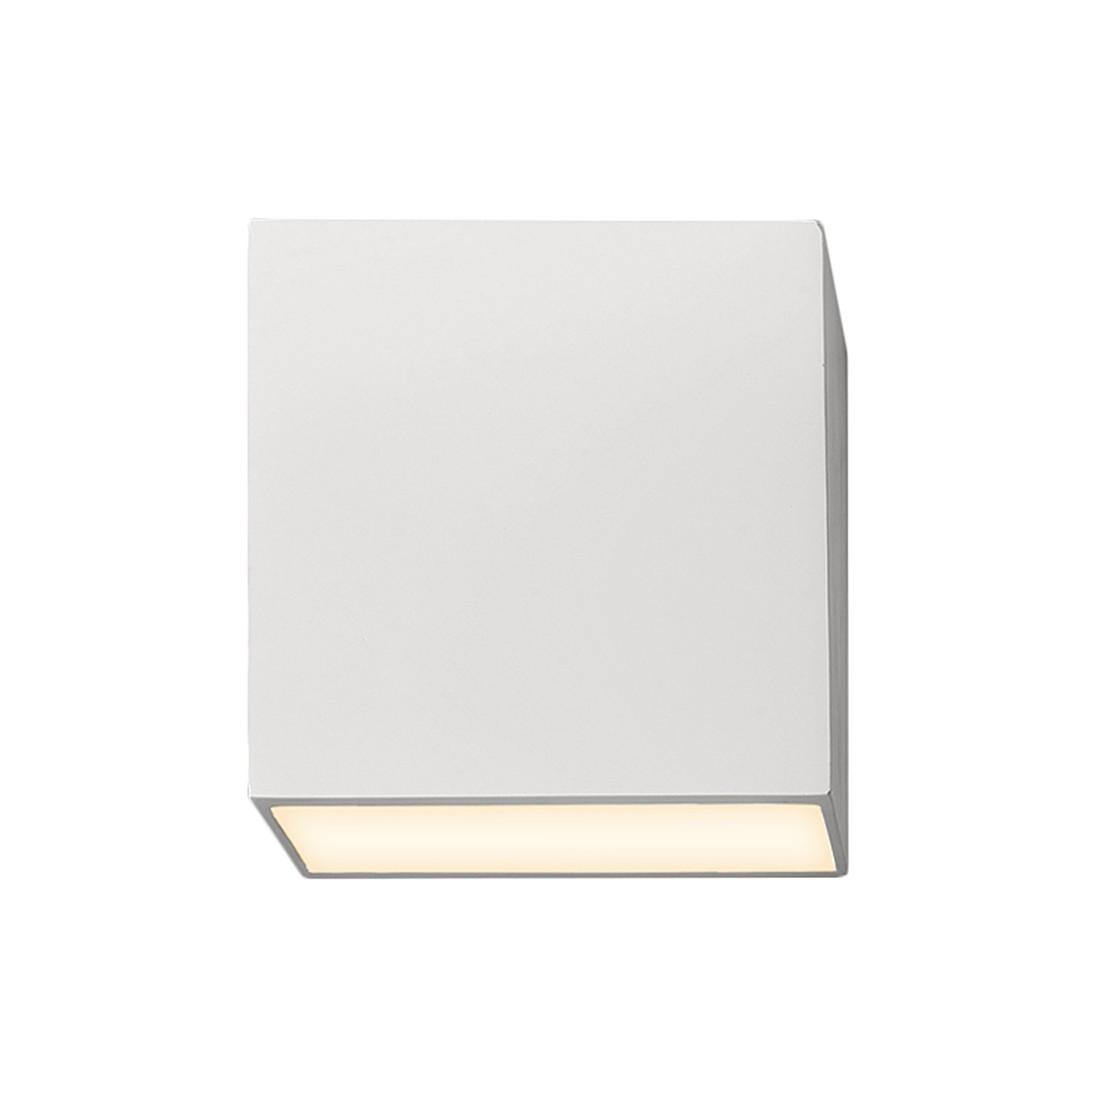 EEK A+, Deckenleuchte Osca Square – Aluminium – 1-flammig, Astro kaufen